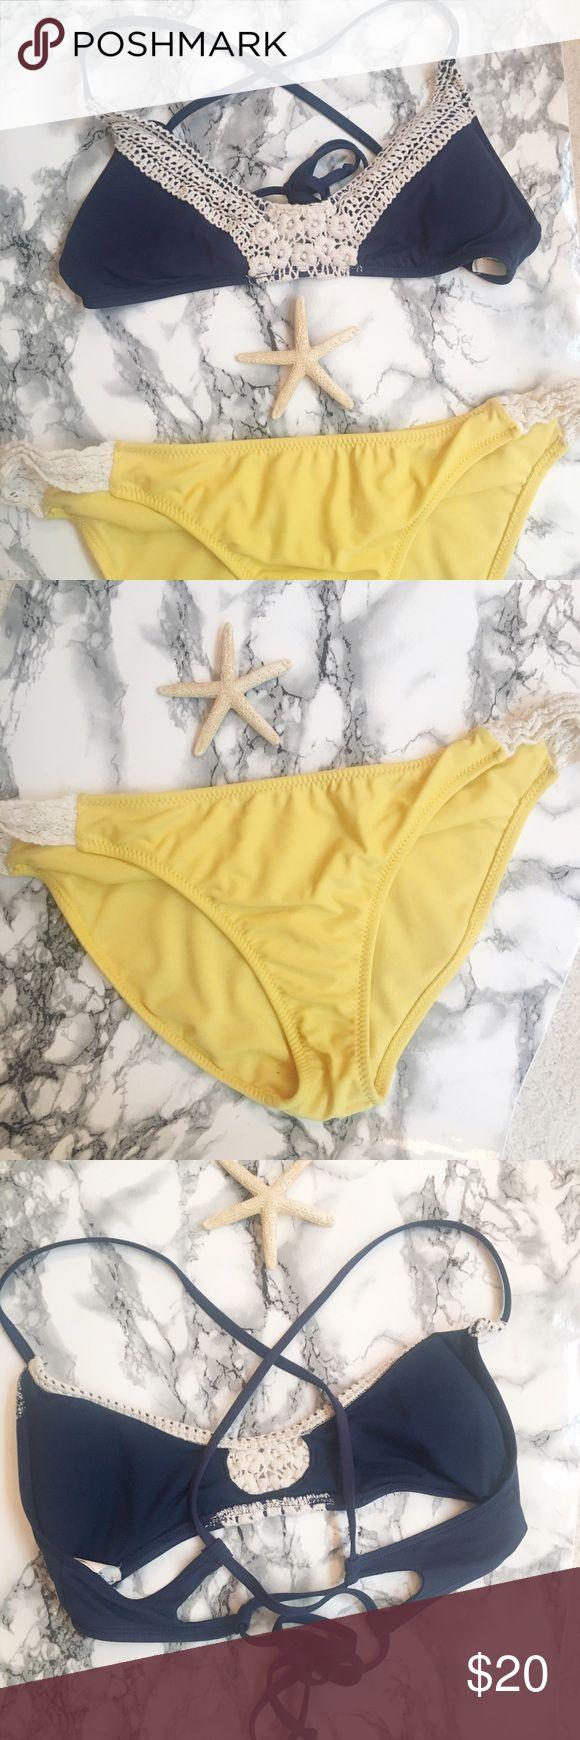 Crochet Detail Bikini M/XL Worn once. Can be split up by request. Yellow XL bottom Jessica Simpson. M Strappy Top Lucky Brand. Offers welcome 💕  Instagram: @shmemilyy17 Snapchat 👻: shmemilyy17 Facebook: www.facebook.com/shmemilyy17 Email: shmemboutique@gmail.com Lucky Brand Swim Bikinis